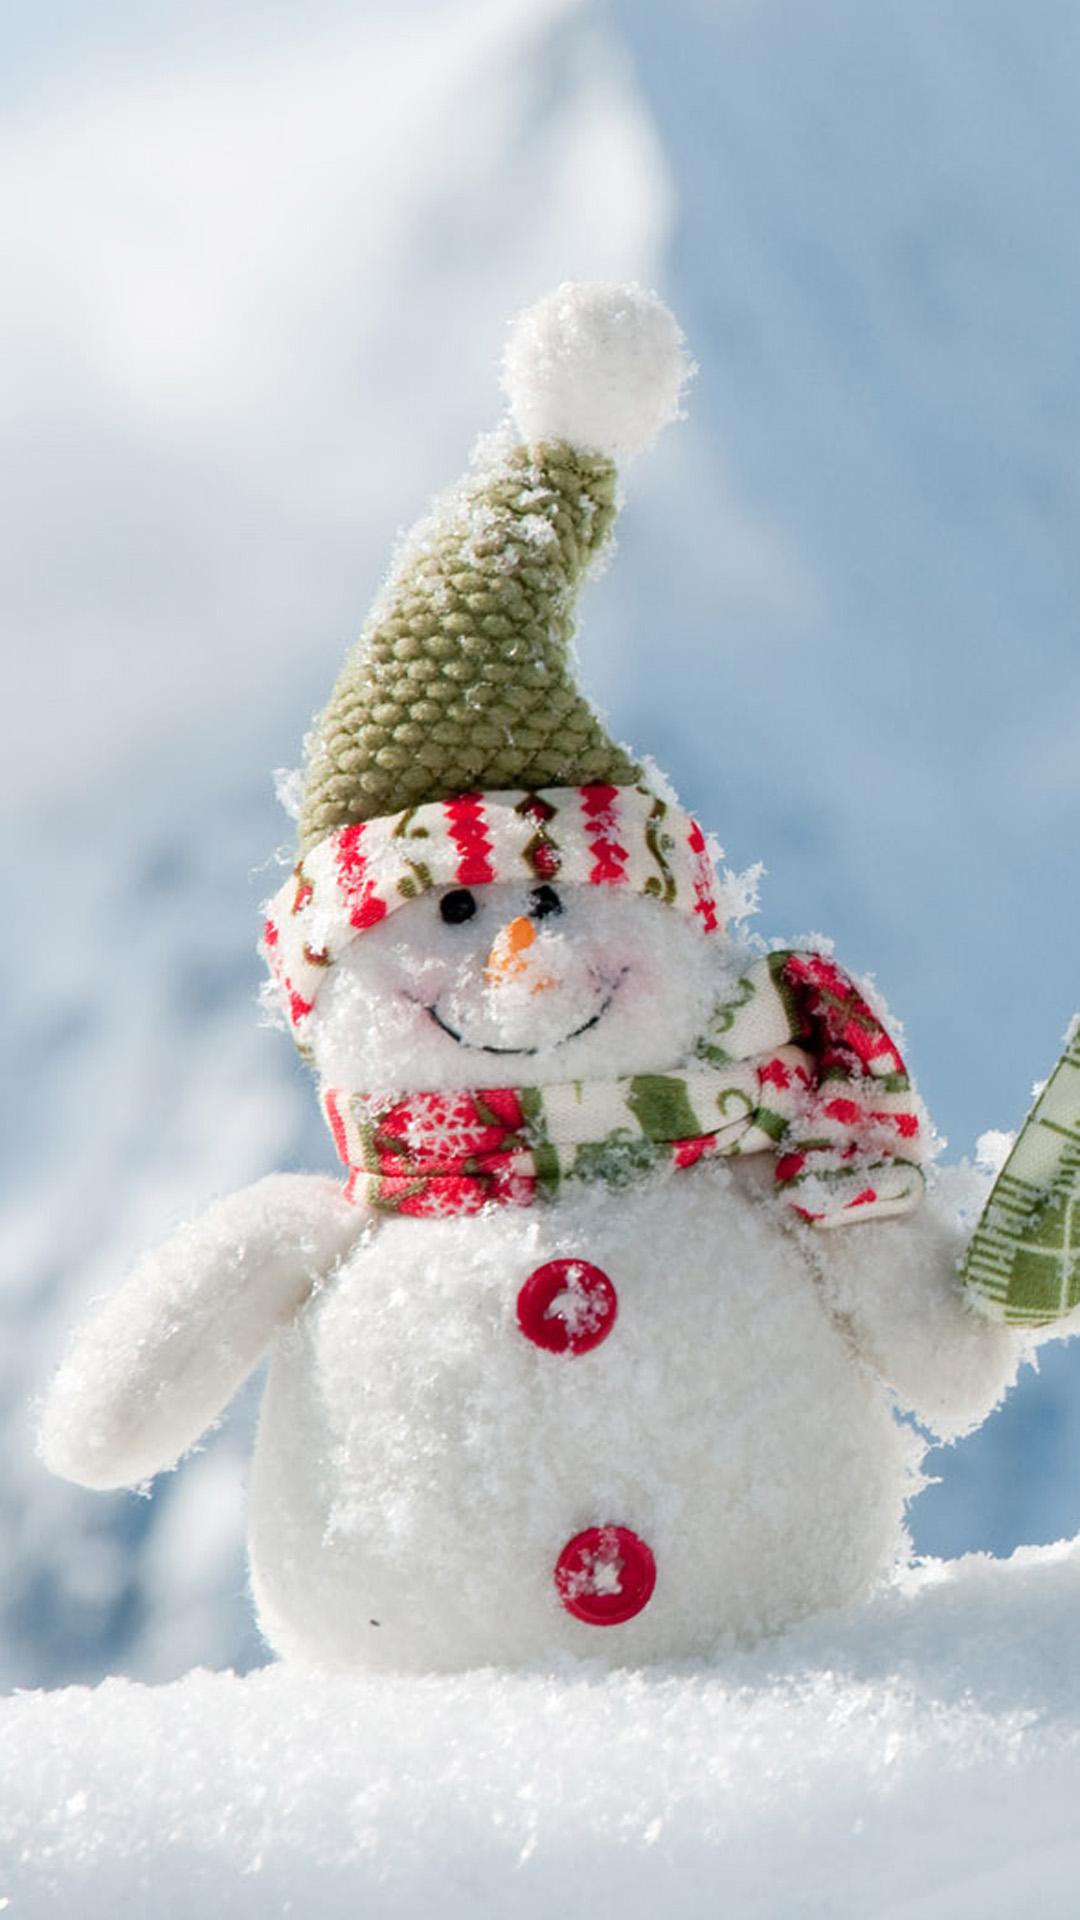 Fantastic Wallpaper Home Screen Christmas - Christmas-Snowman  Best Photo Reference_628226.jpg